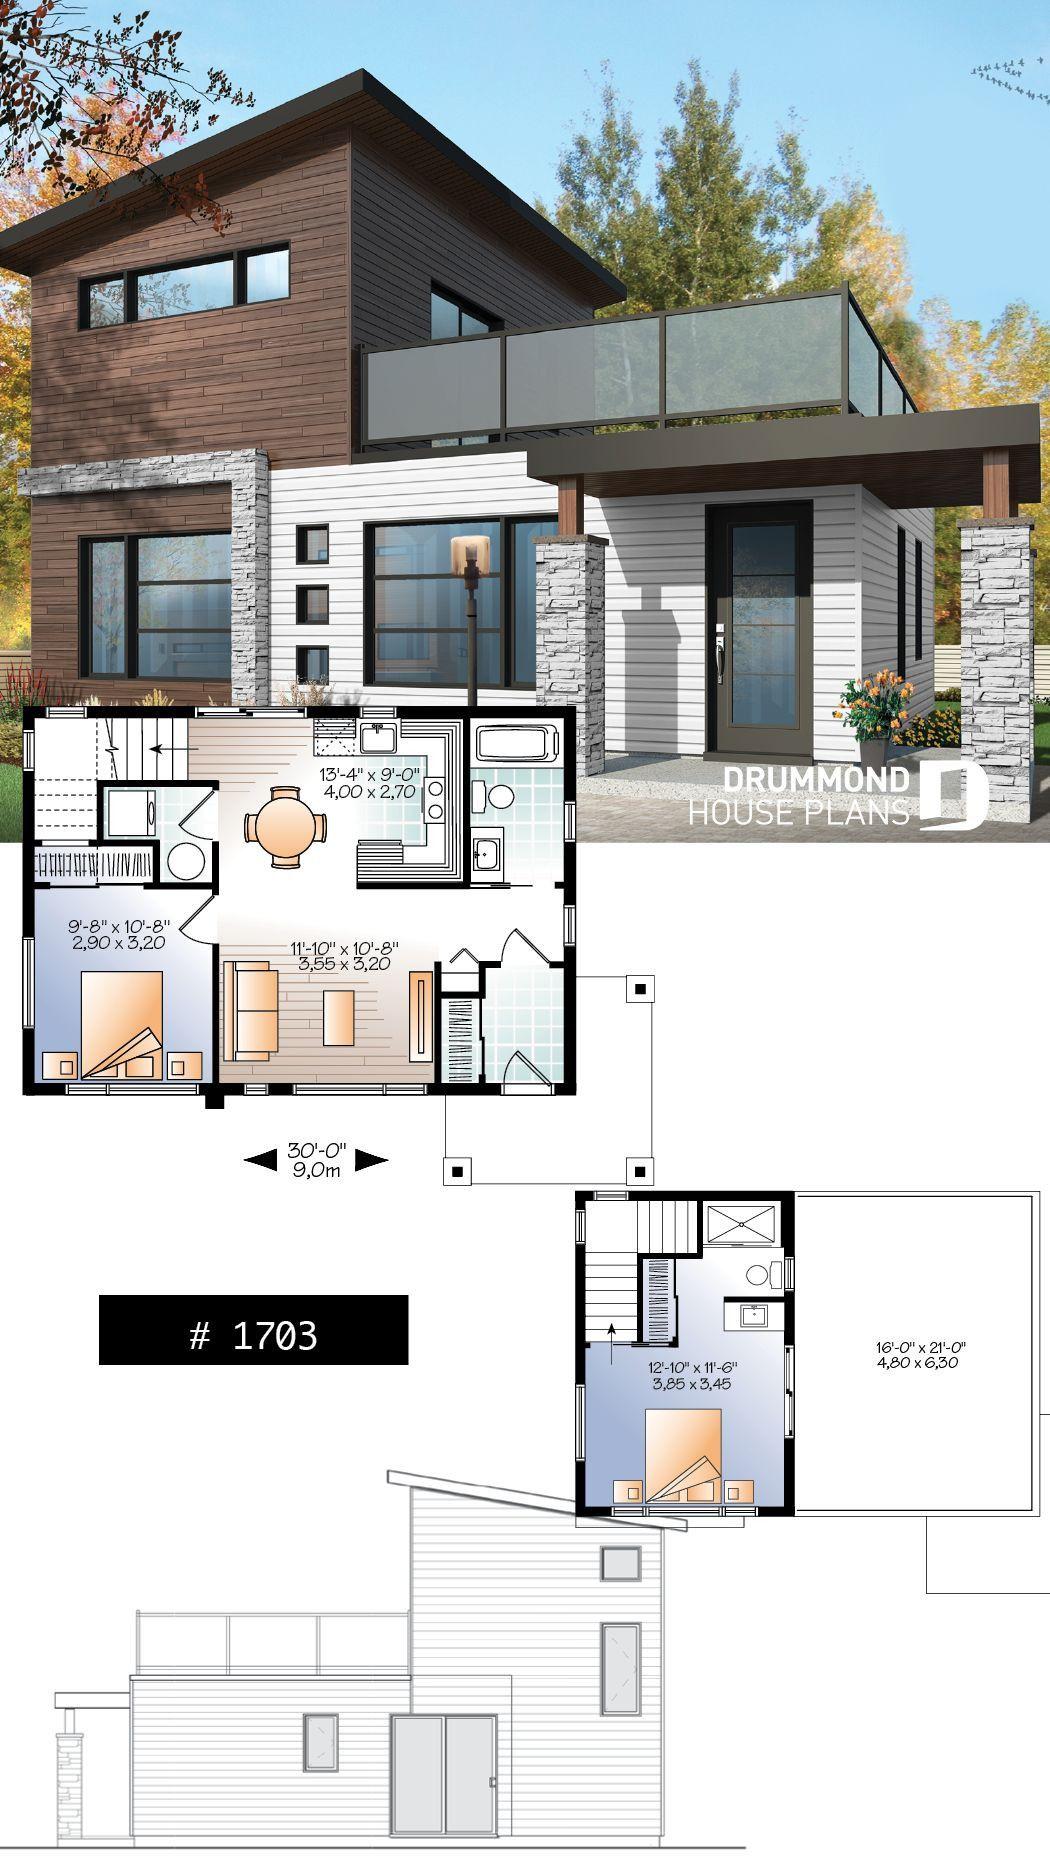 Luxury Small House Plans 2 Floors Modern Design House Plan Joshua No 1703 Arsitektur Rumah Denah Rumah Desain Rumah